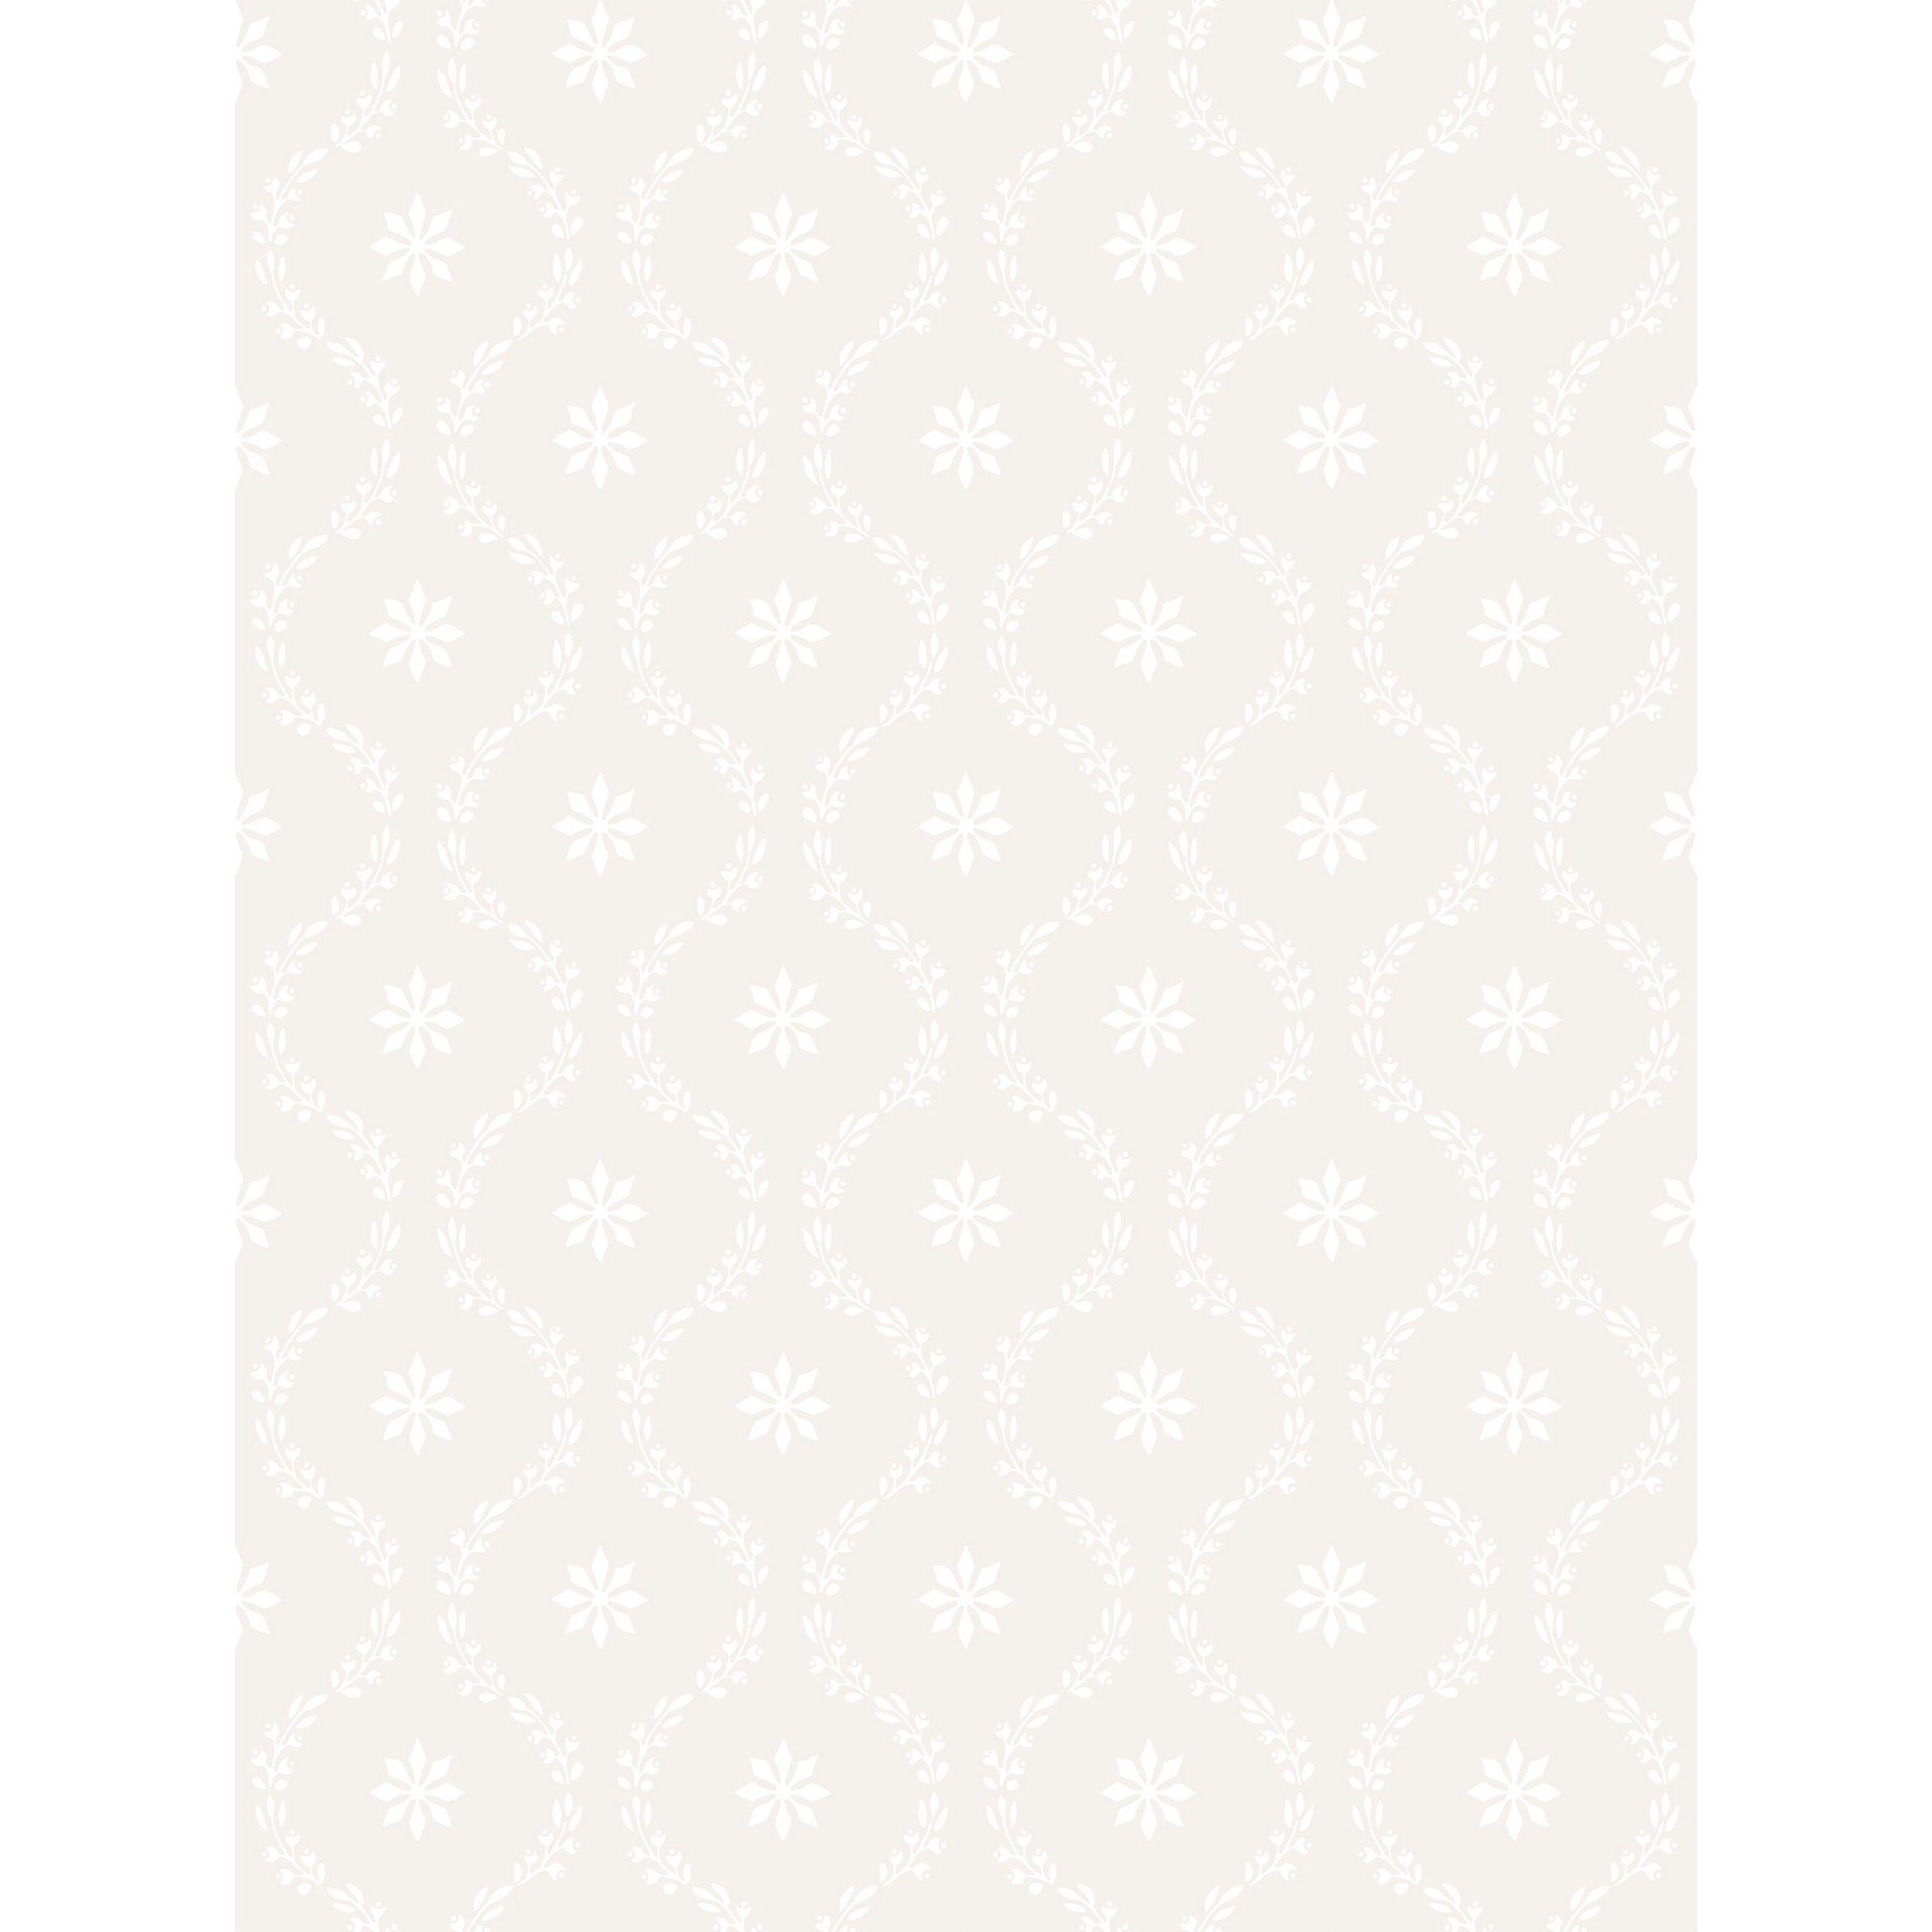 Clandon Snow Wallpaper roll, Wall coverings, Lee jofa